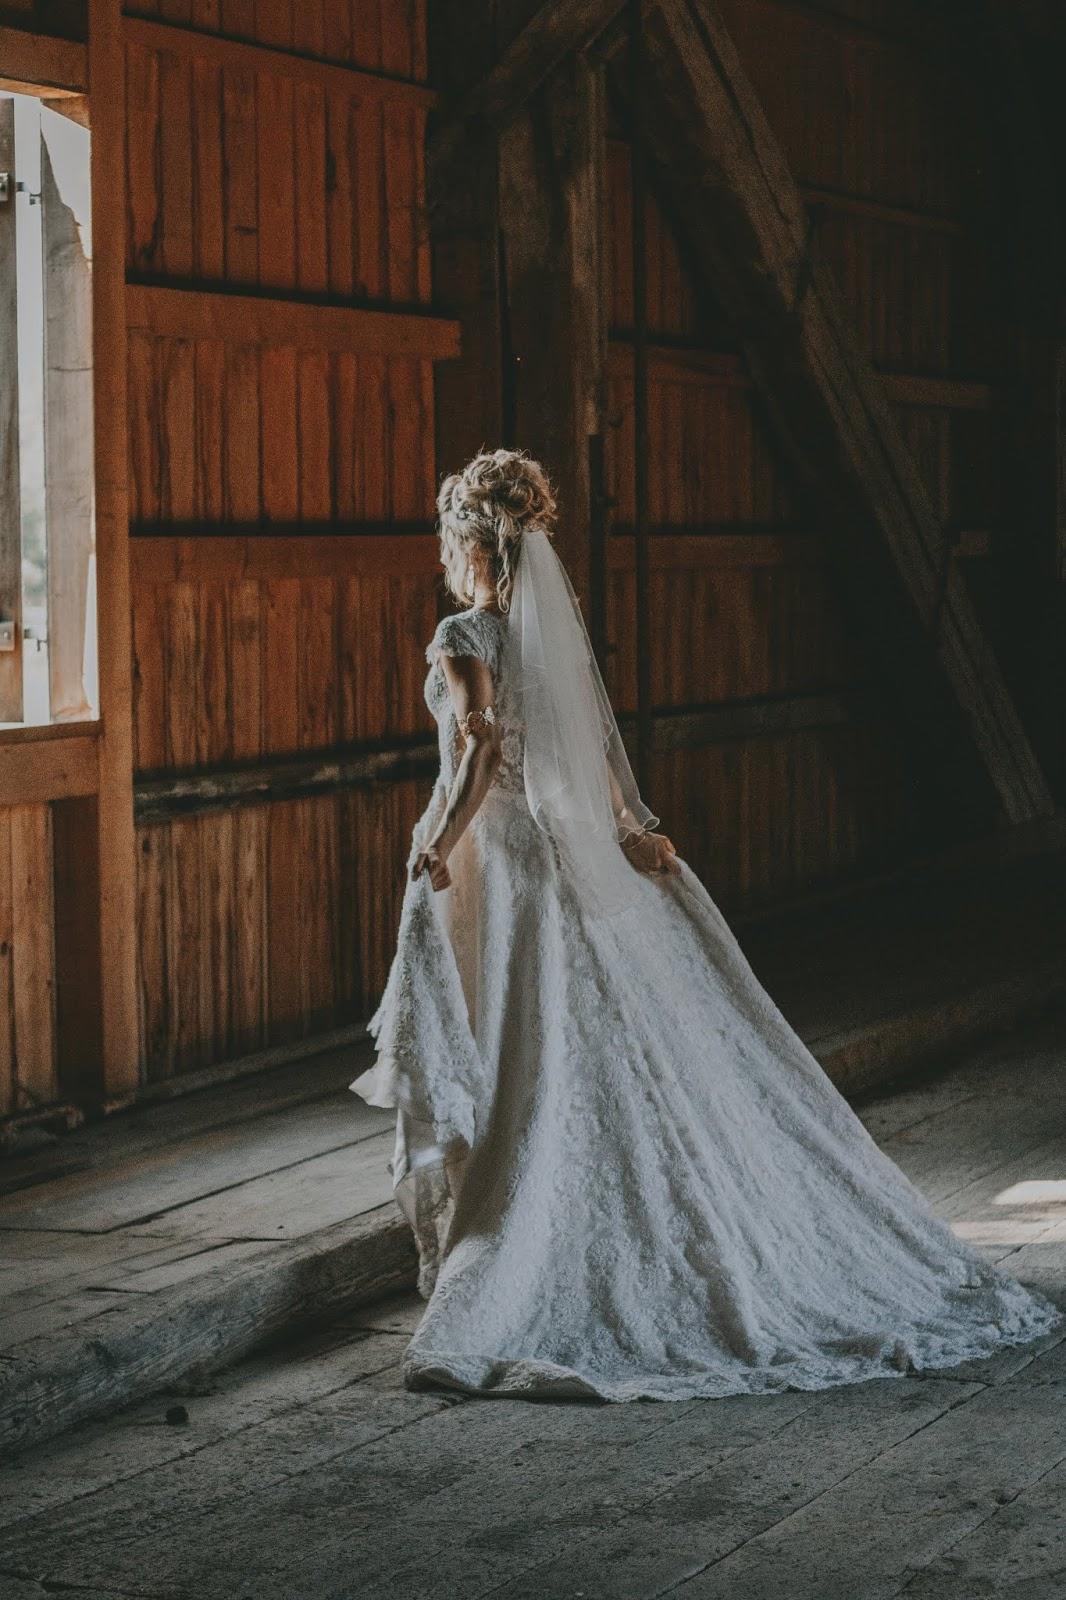 Wedding Dress Designers Games.Weddings Trends Wedding Dress Designer Games